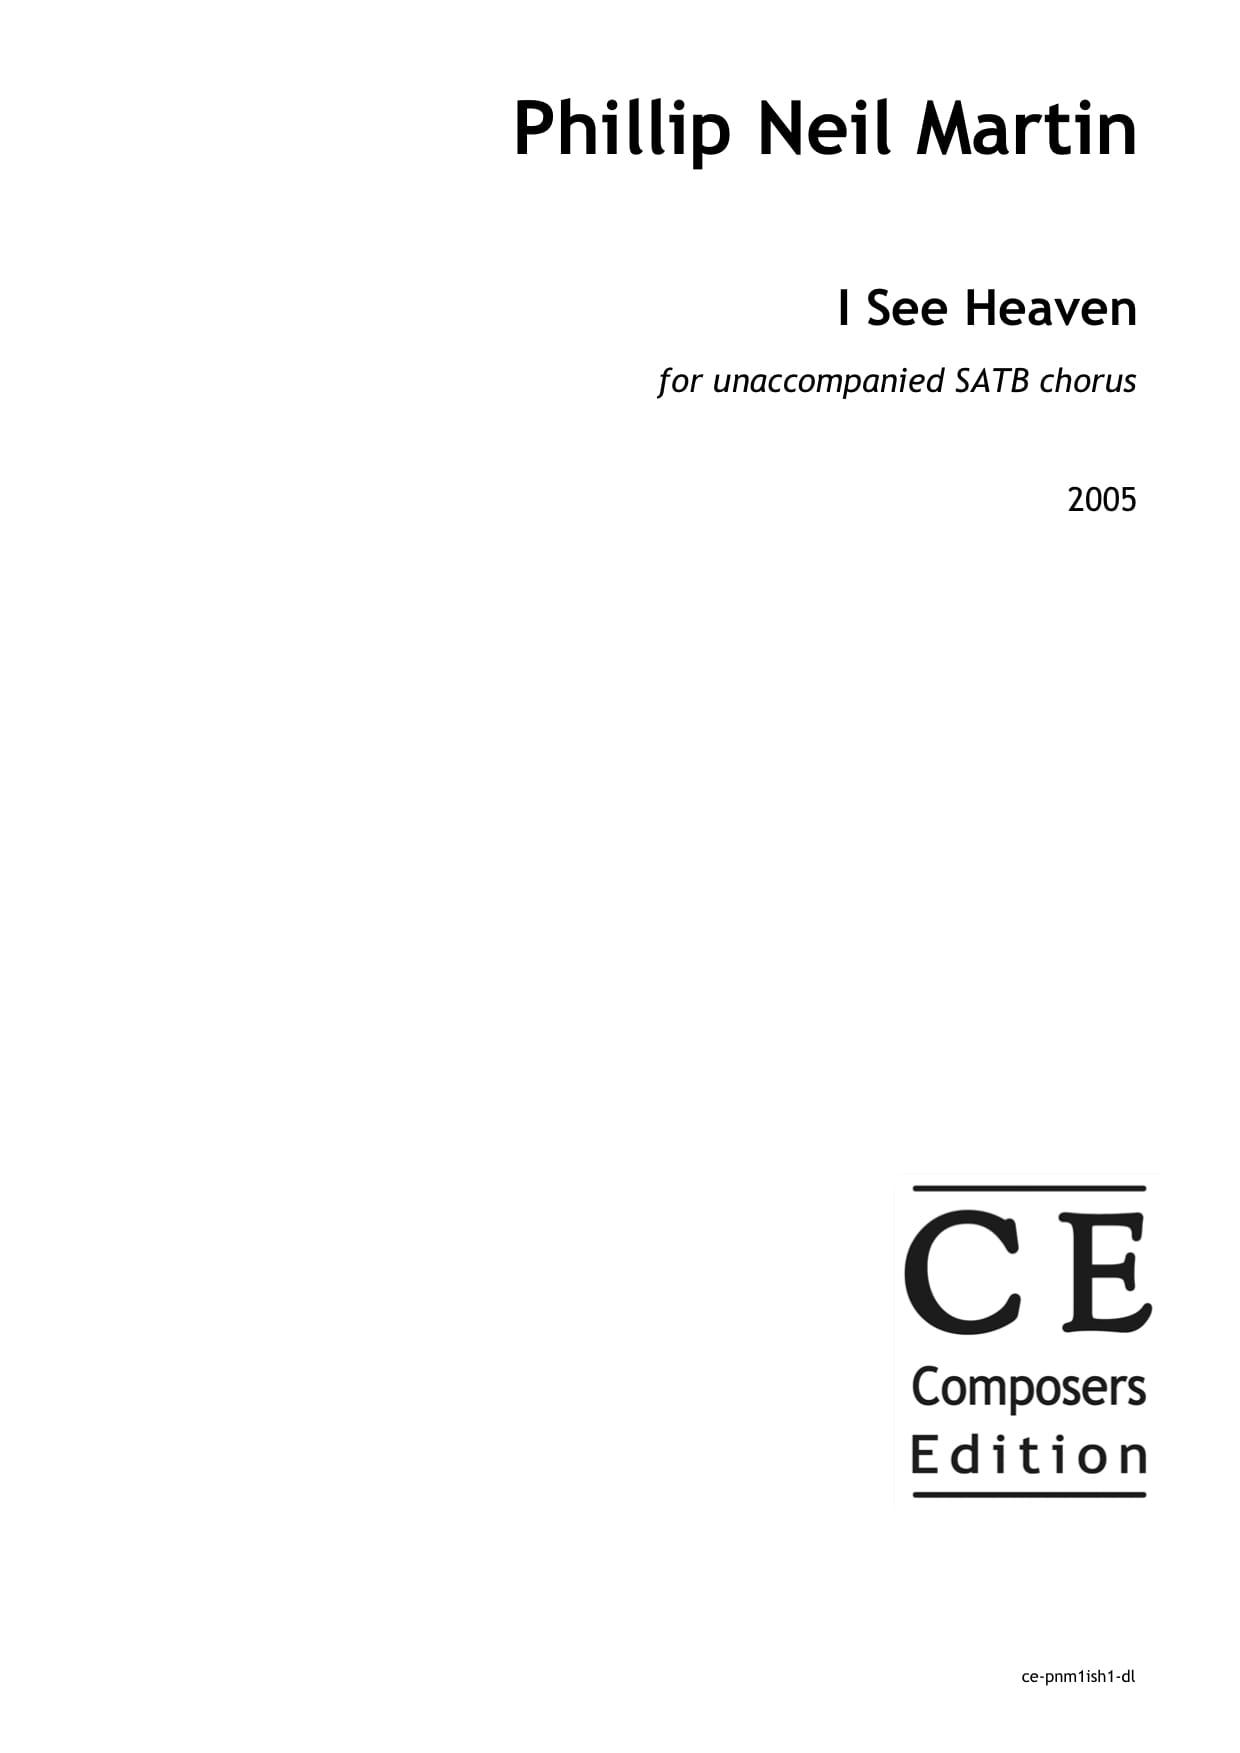 Phillip Neil Martin: I See Heaven for unaccompanied SATB chorus